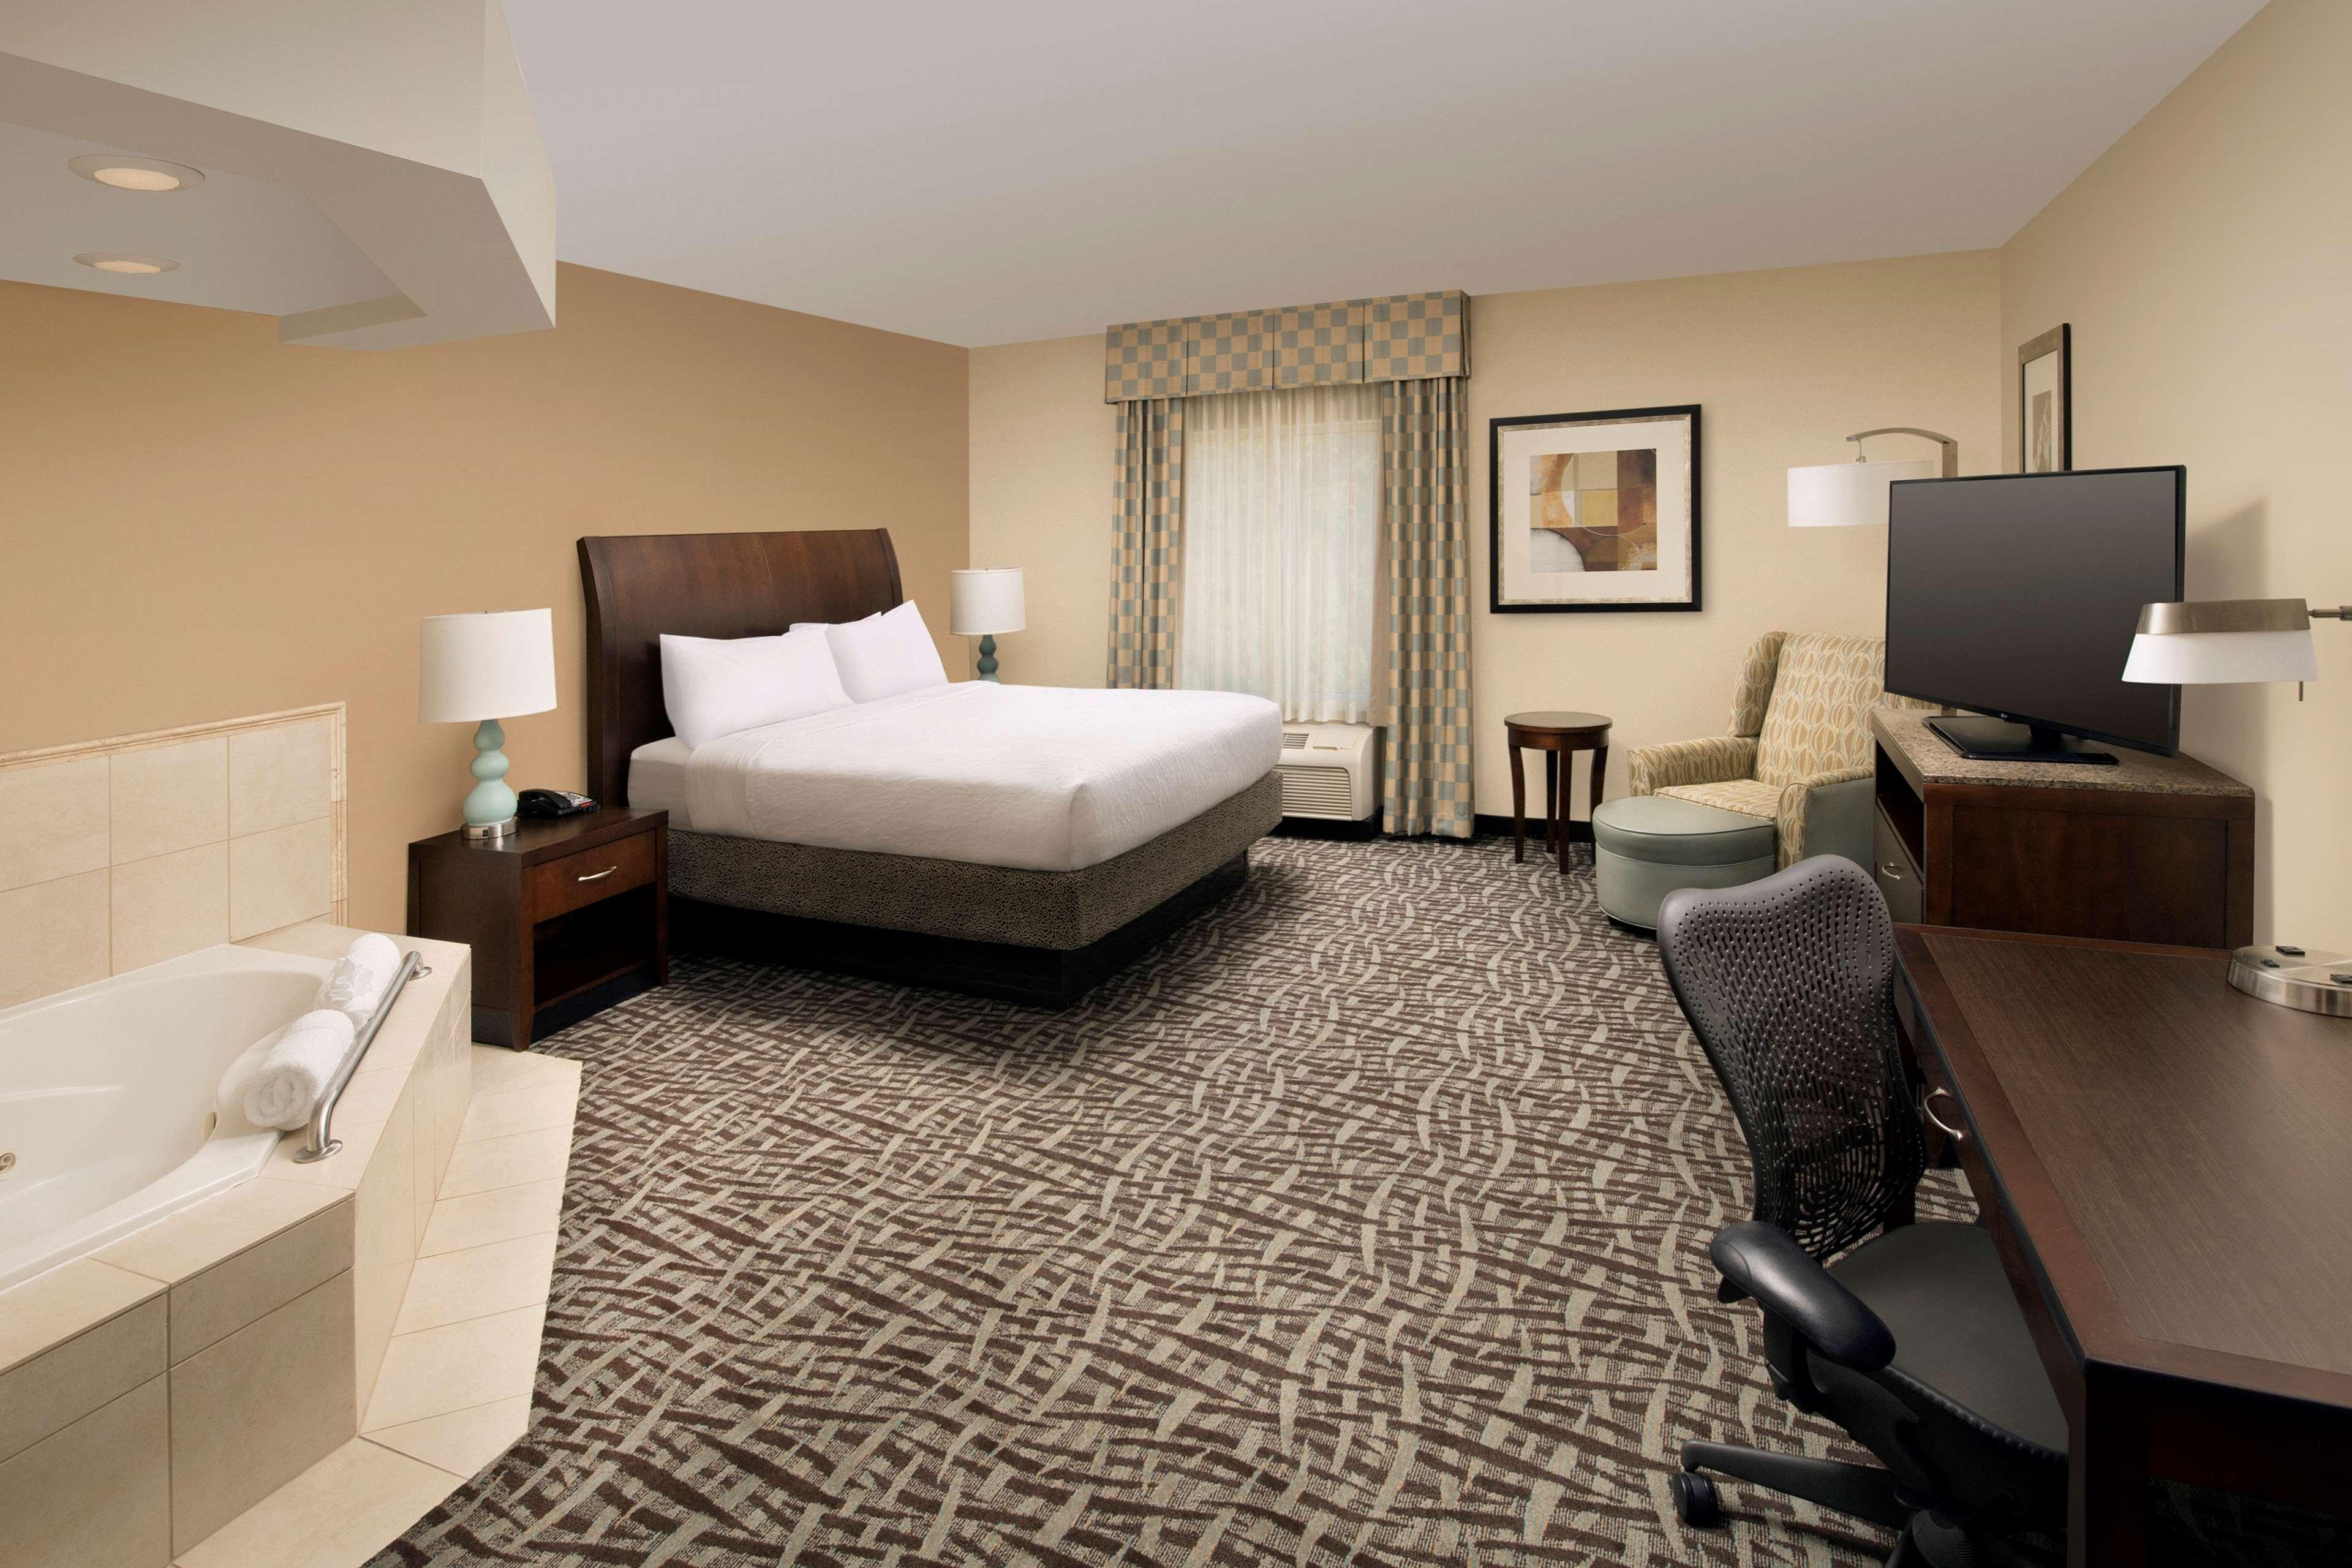 Hilton Garden Inn Winston-Salem/Hanes Mall image 18